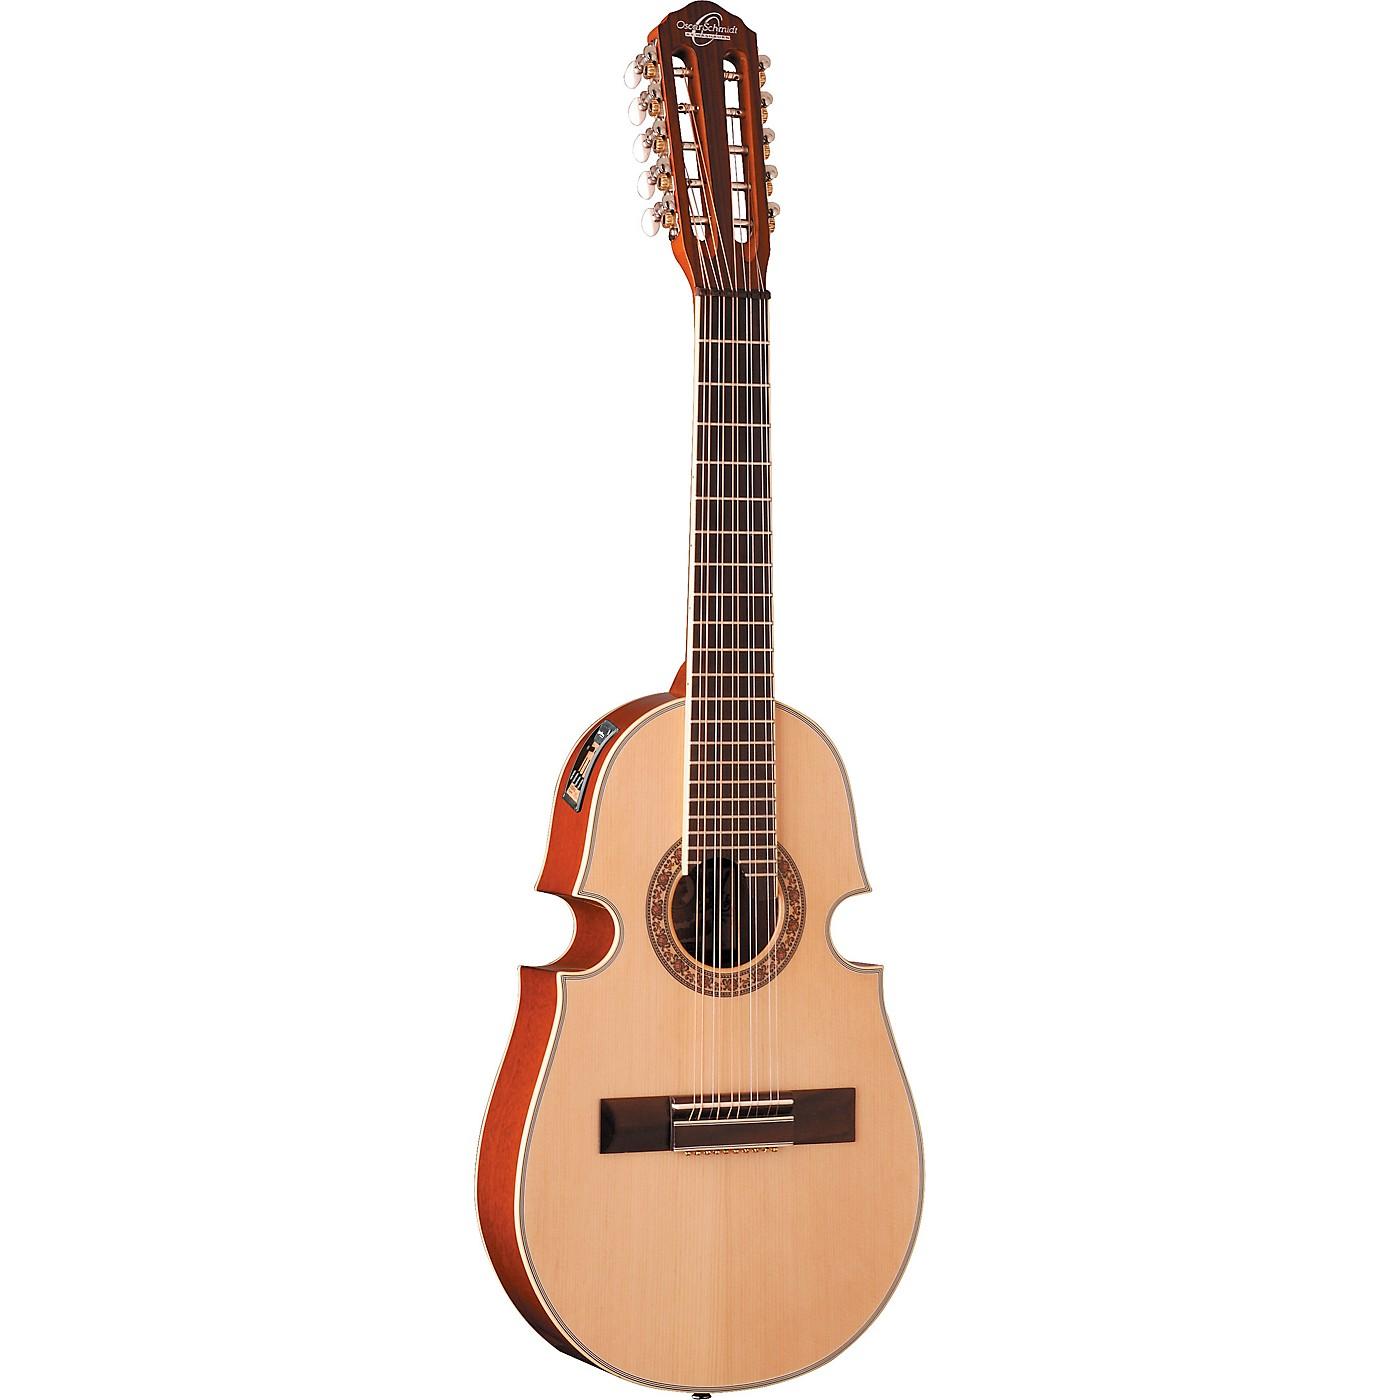 Oscar Schmidt OQ40SE-O Acoustic Electric Cuatro 10 String Guitar thumbnail